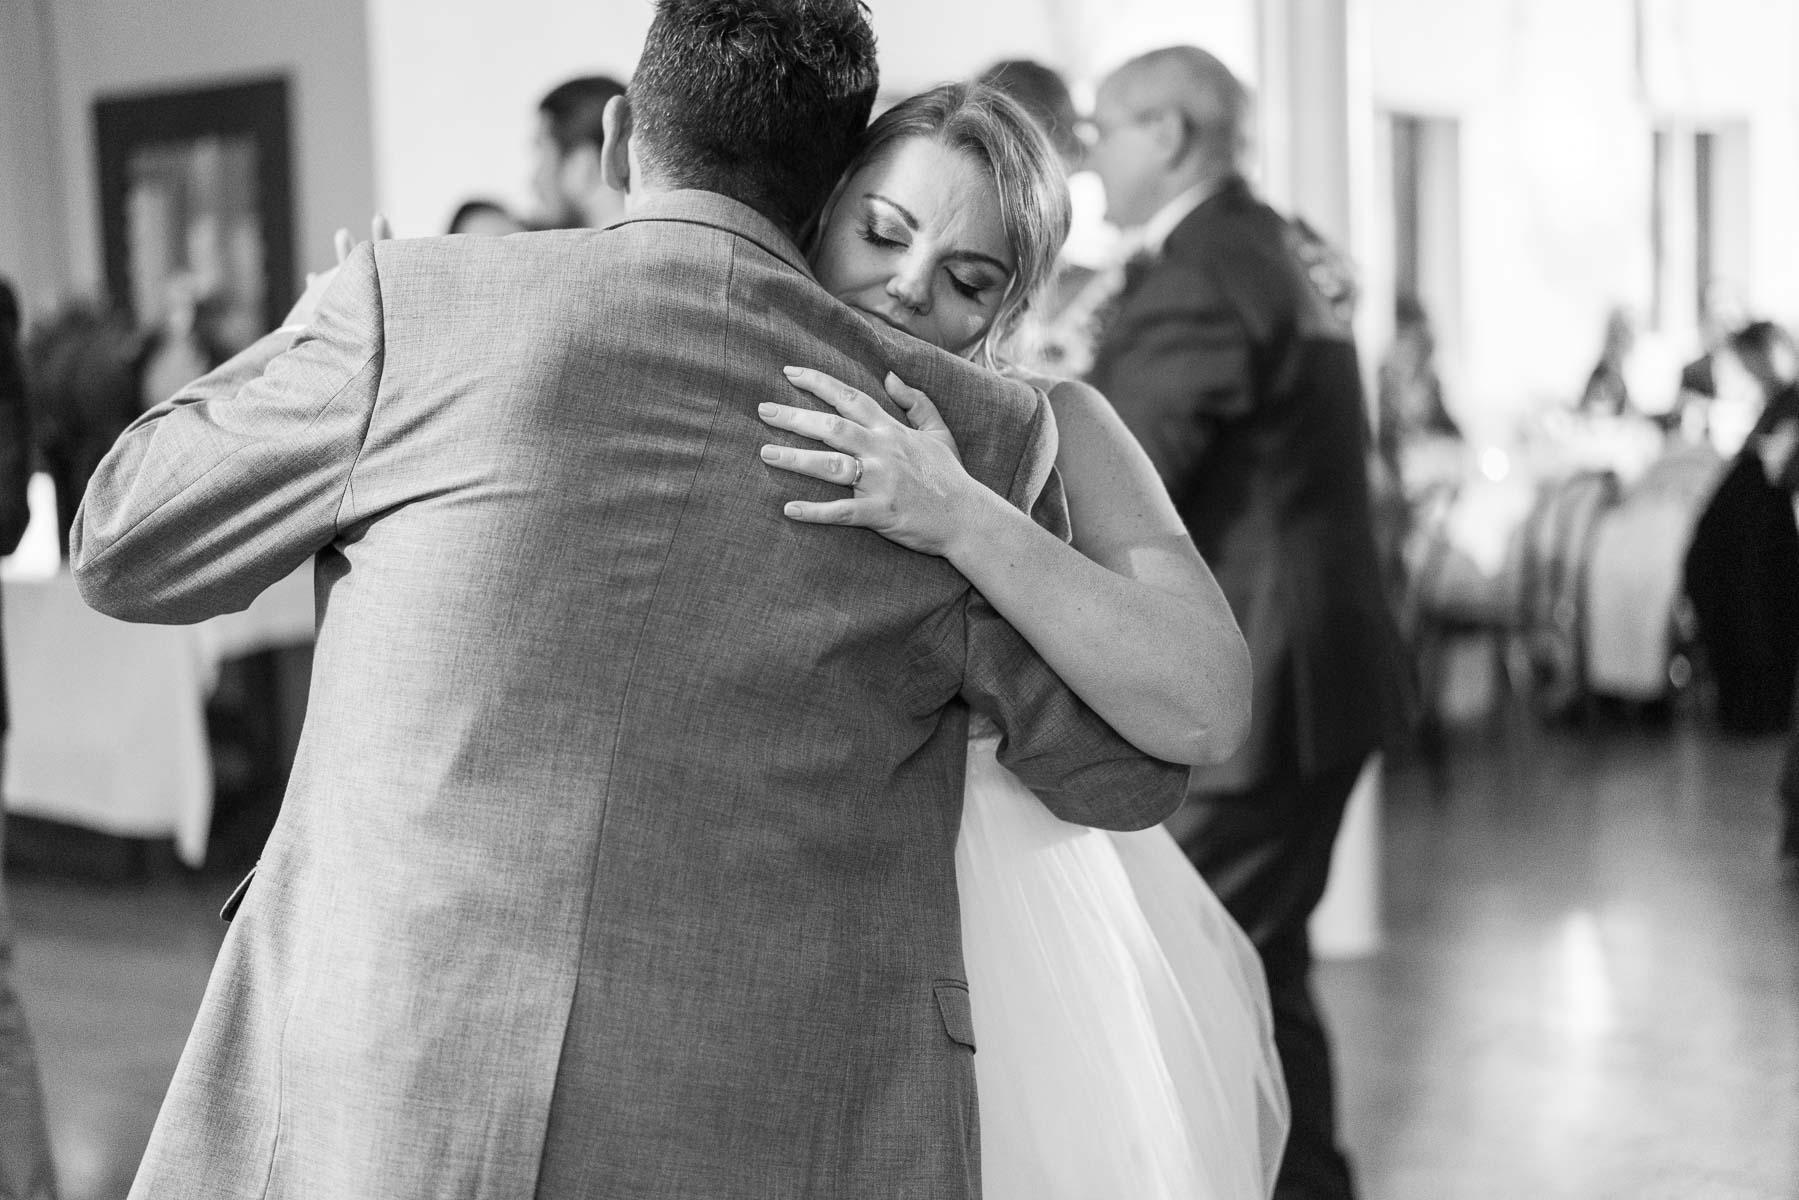 lindenderry-wedding-heart+soul-weddings-amy-alain-03941.jpg